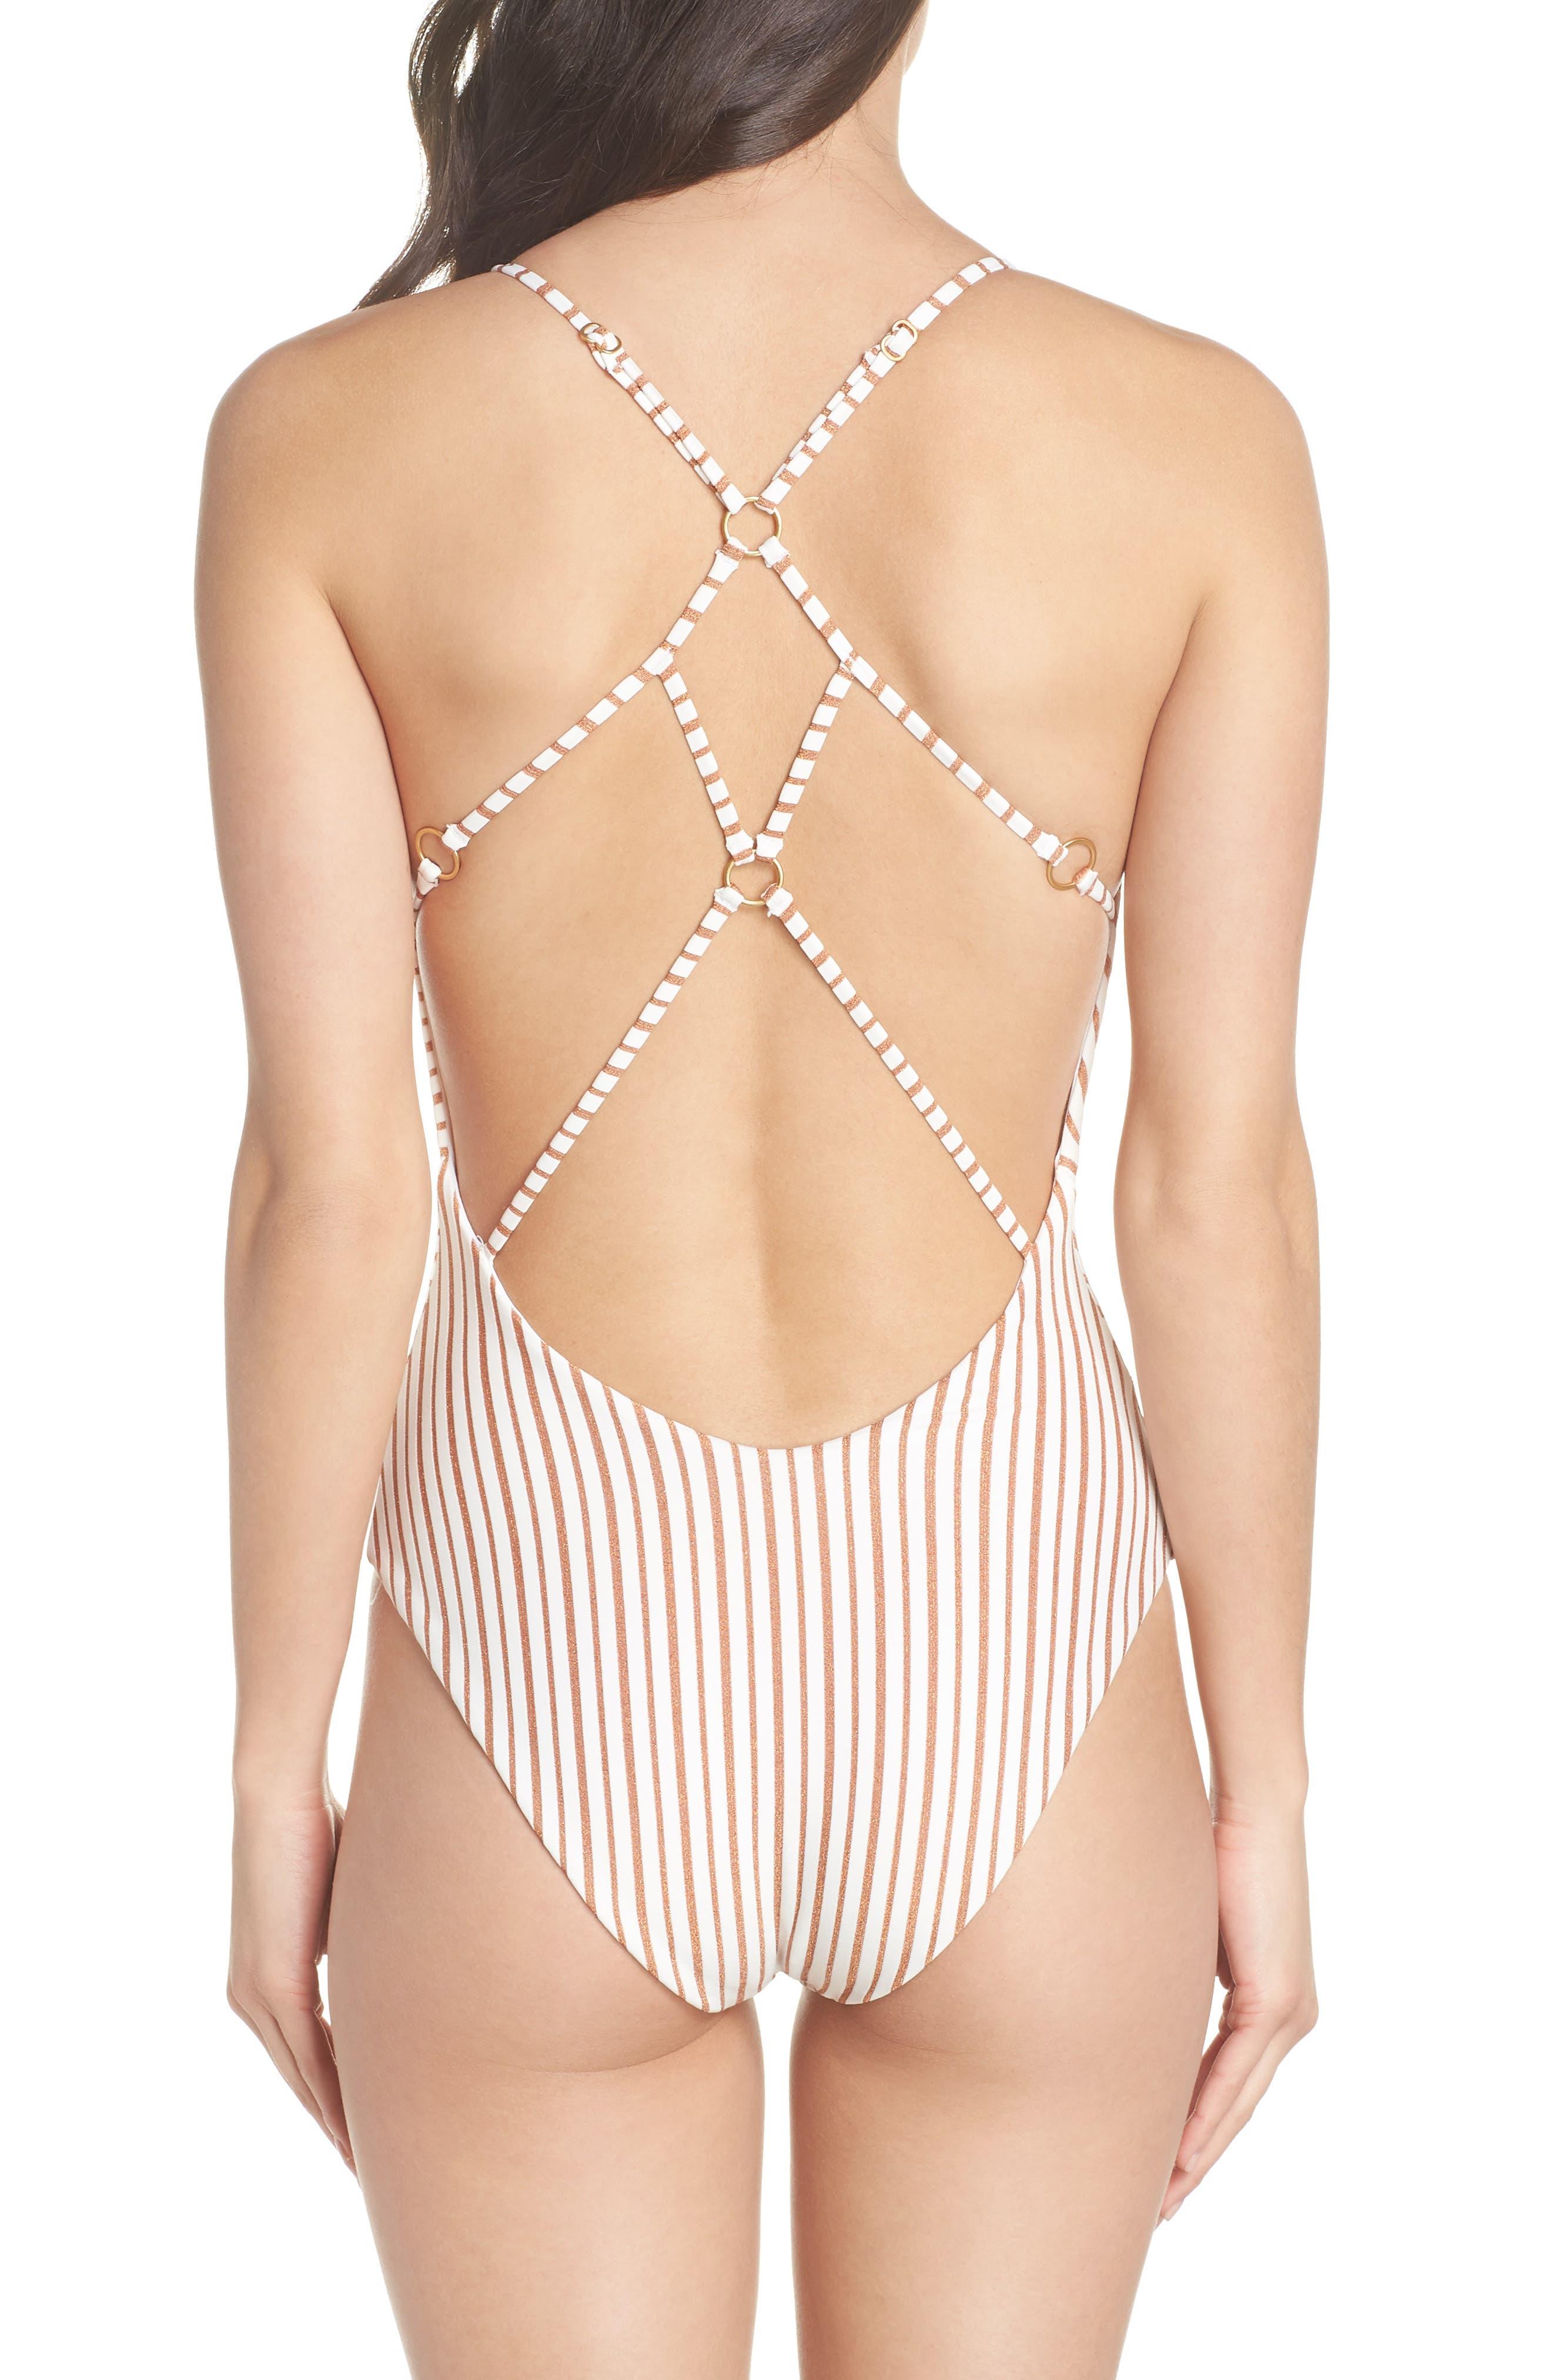 Blair One-Piece Swimsuit,                             Alternate thumbnail 2, color,                             White